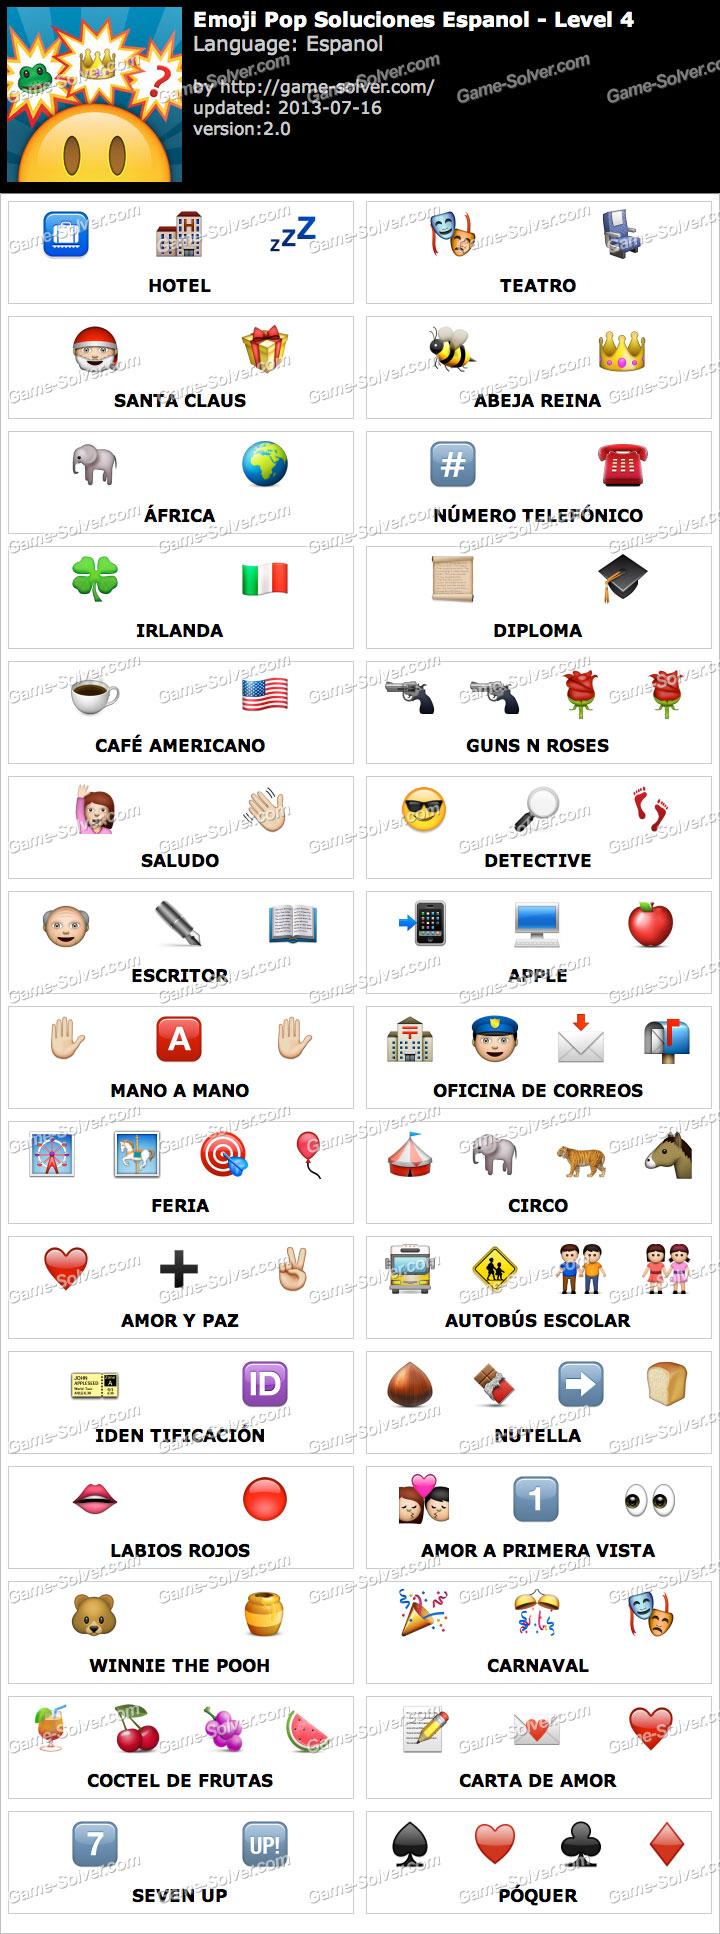 emoji pop nivel 4 game solver